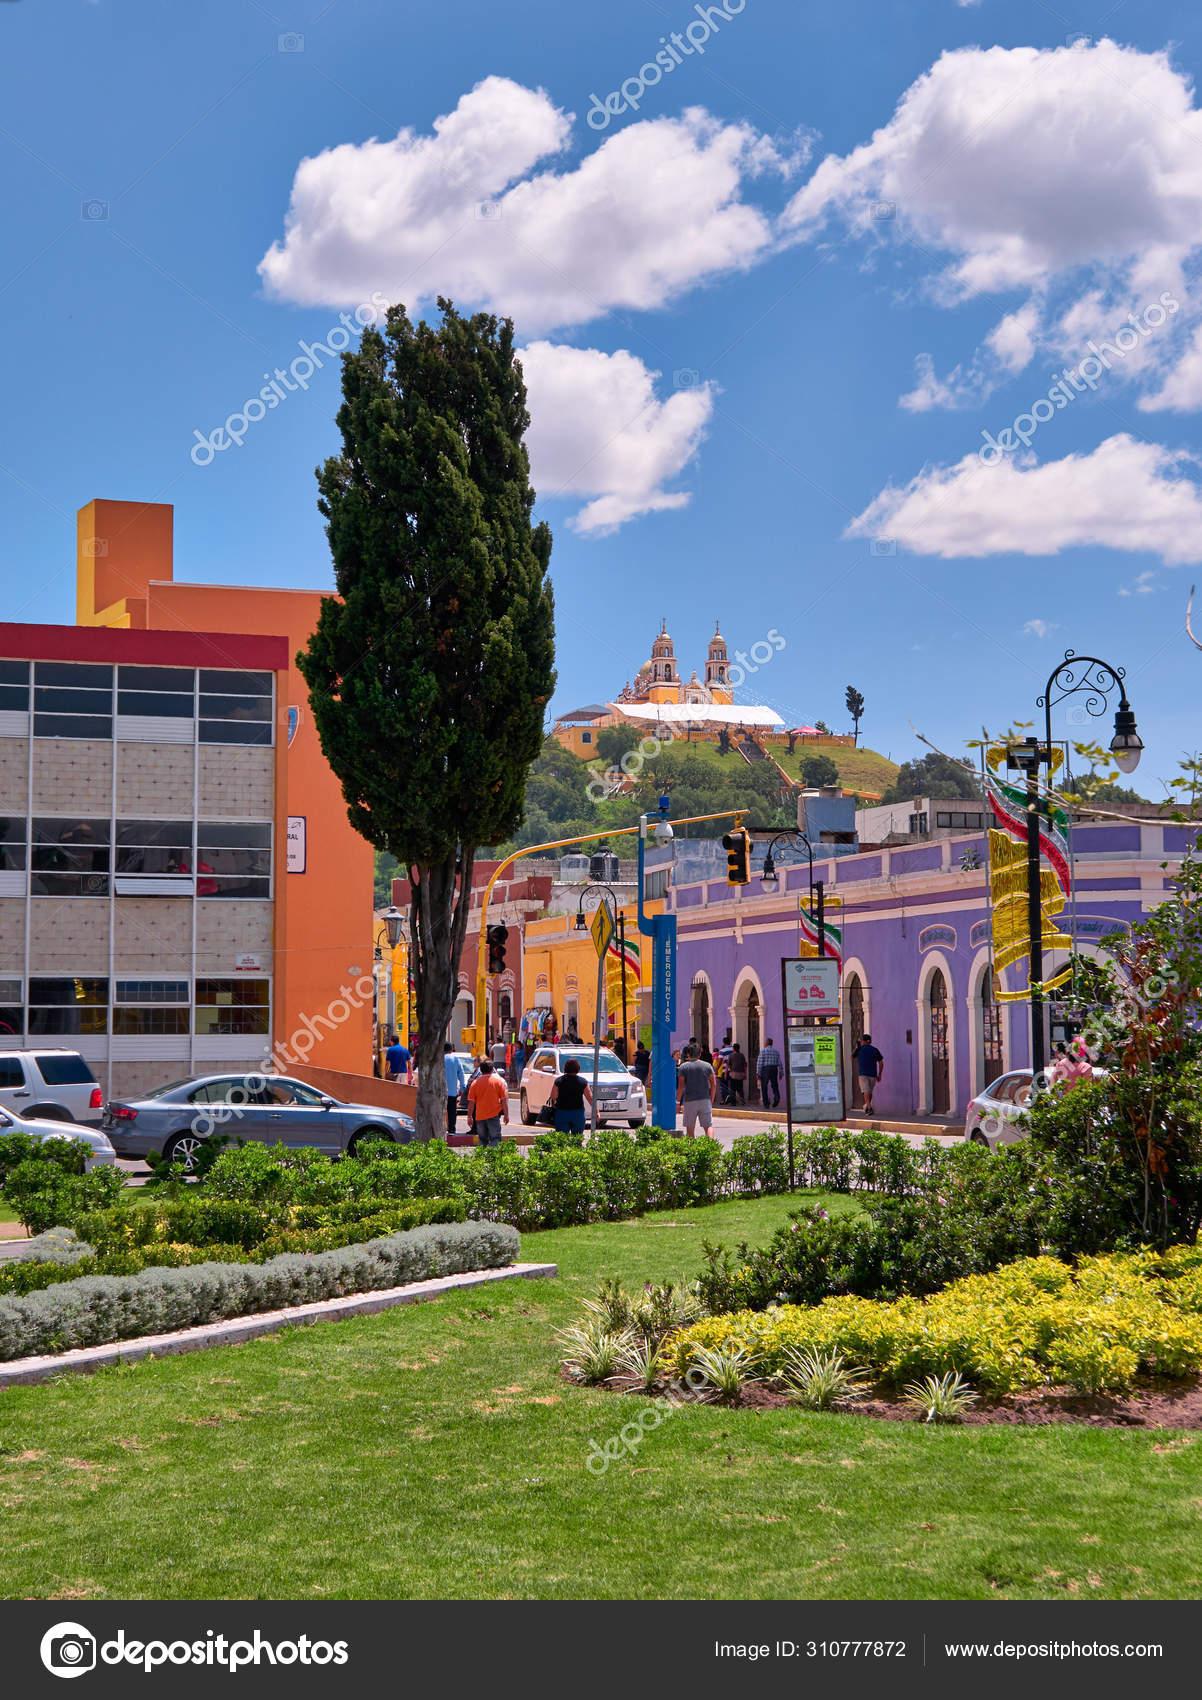 Plaza De La Concordia garden of plaza de la concordia in san pedro cholula – stock